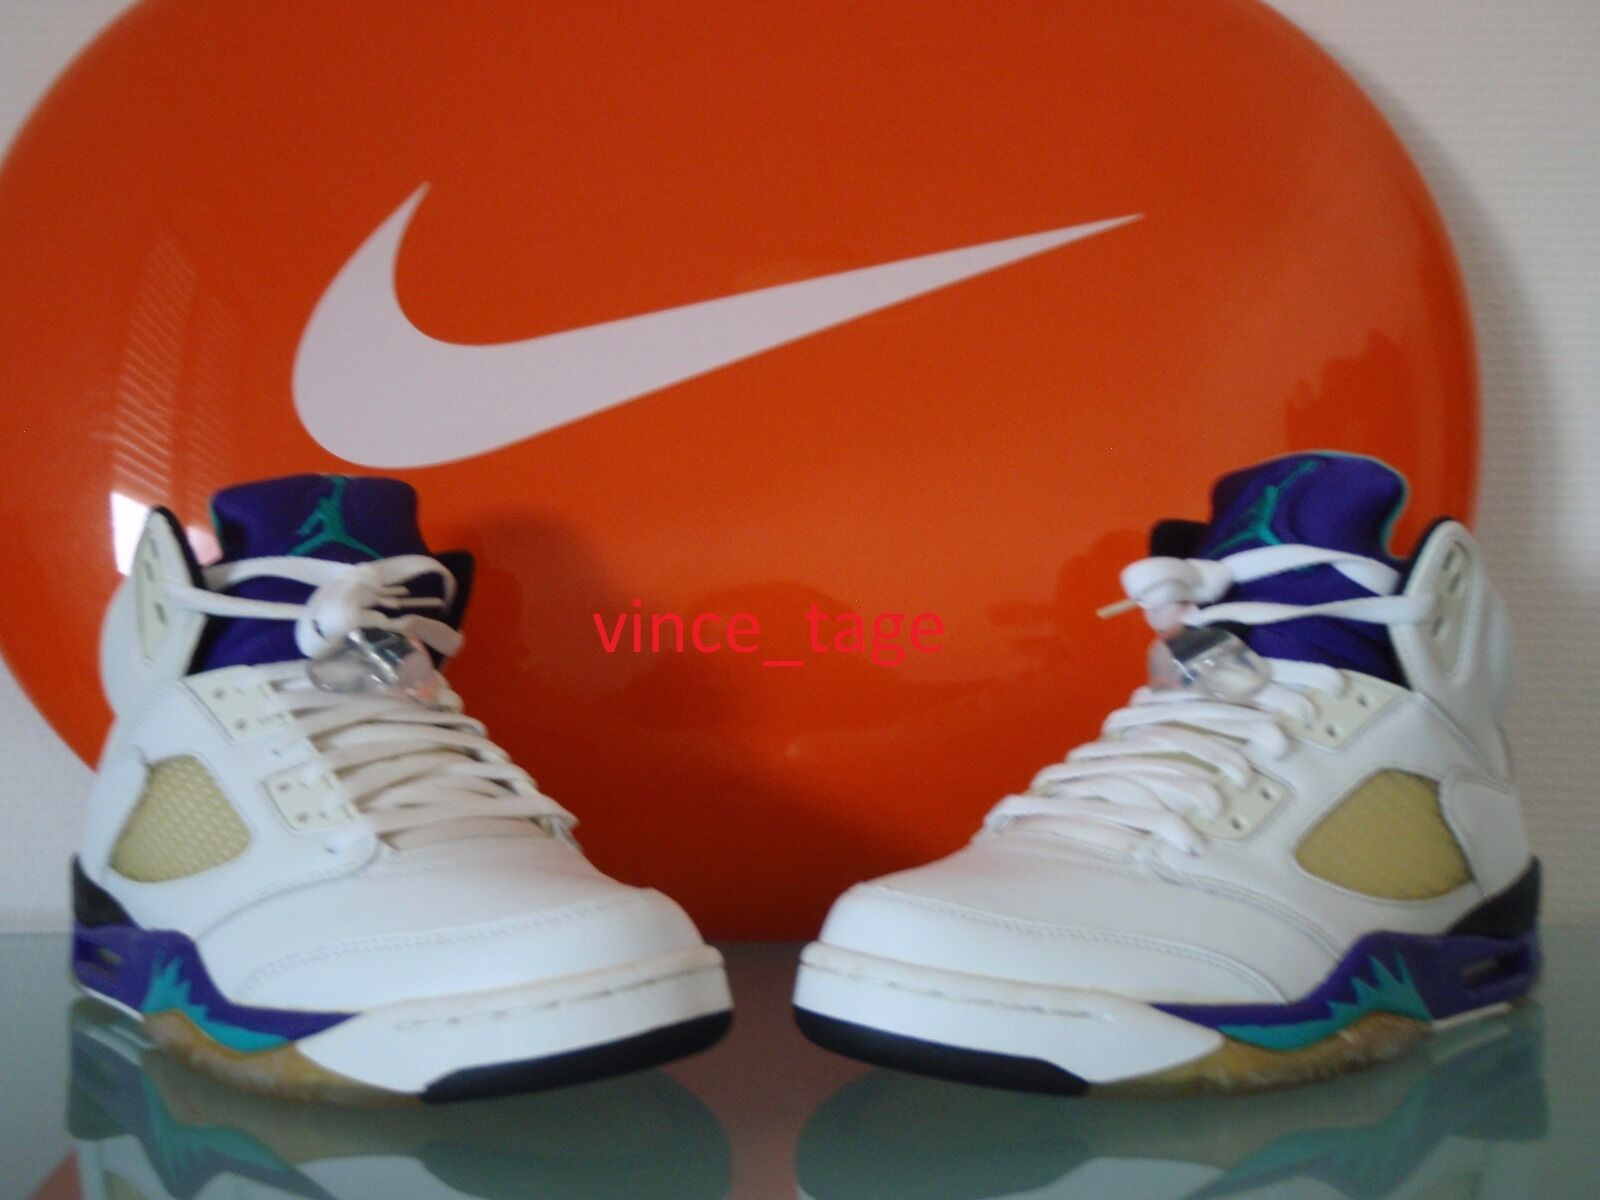 New 2006 Nike Air Jordan V 5 Retro LS blanc EMERALD GRAPE ICE 10 US 44 EUR 6 4 3